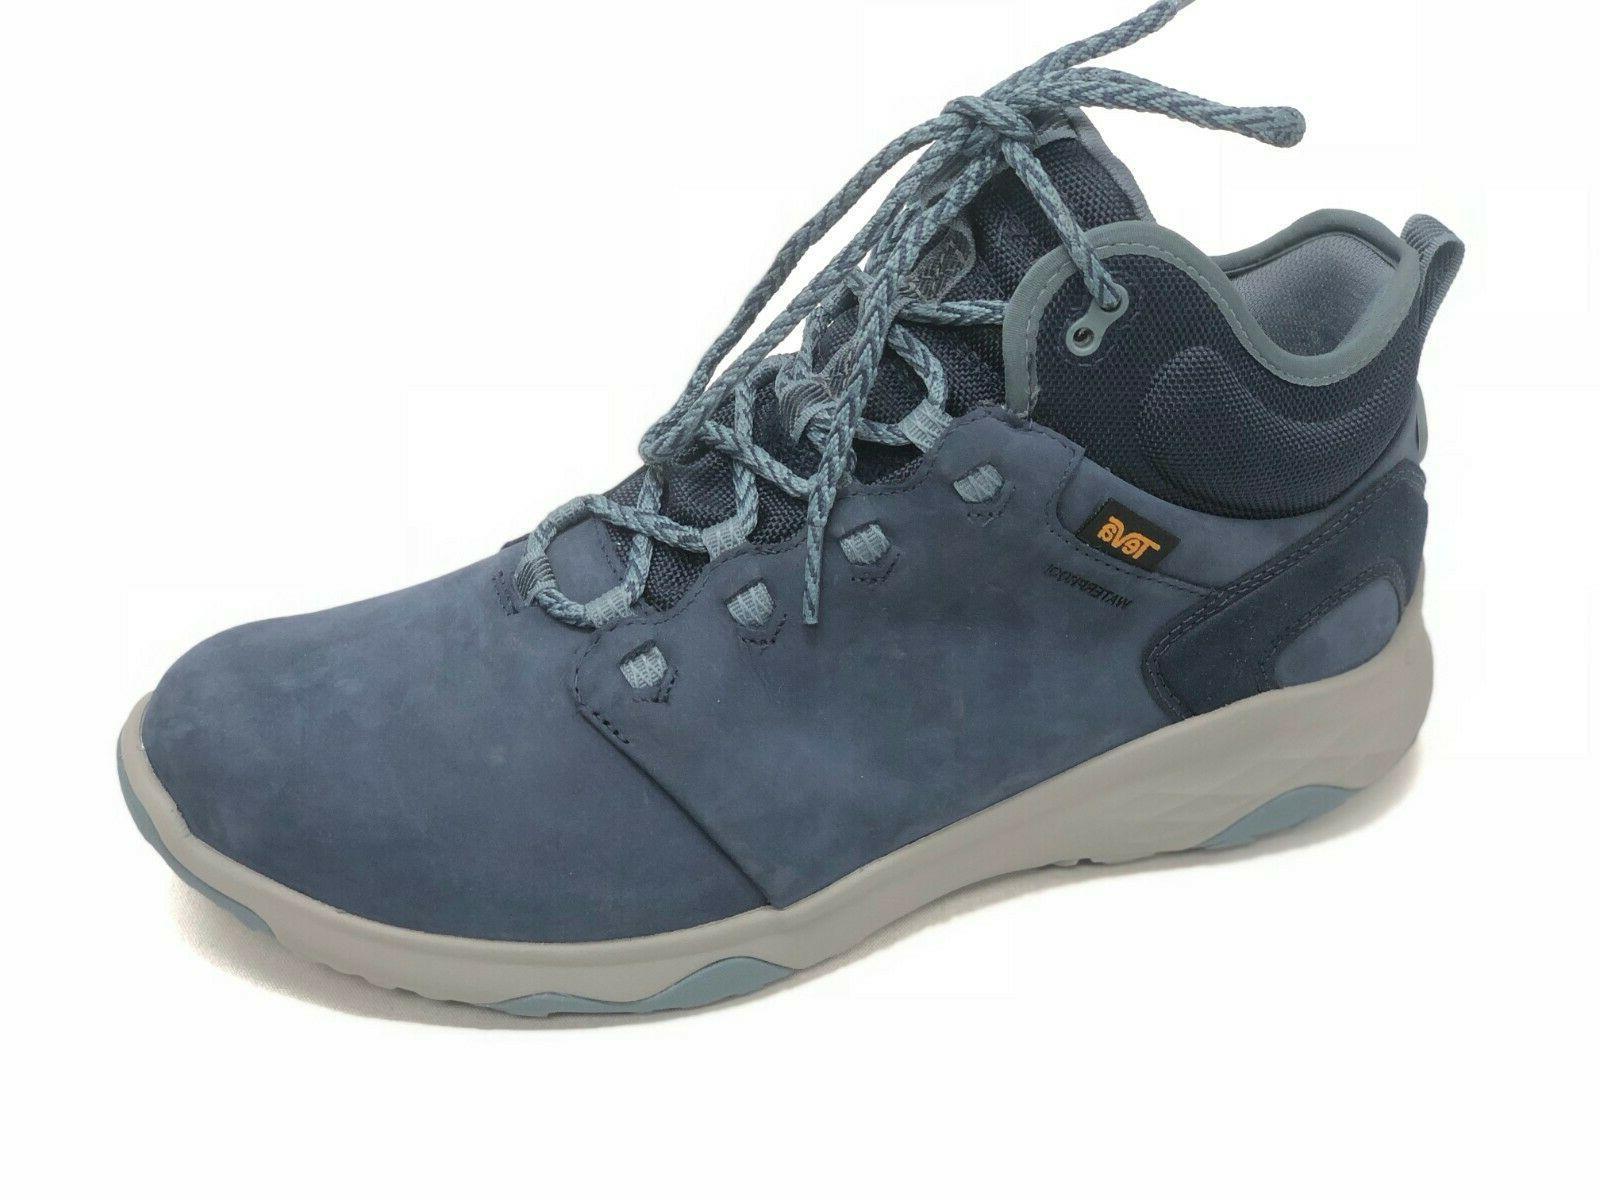 Teva Womens Arrowood 2 Mid Waterproof Leather Hiking Boots 1